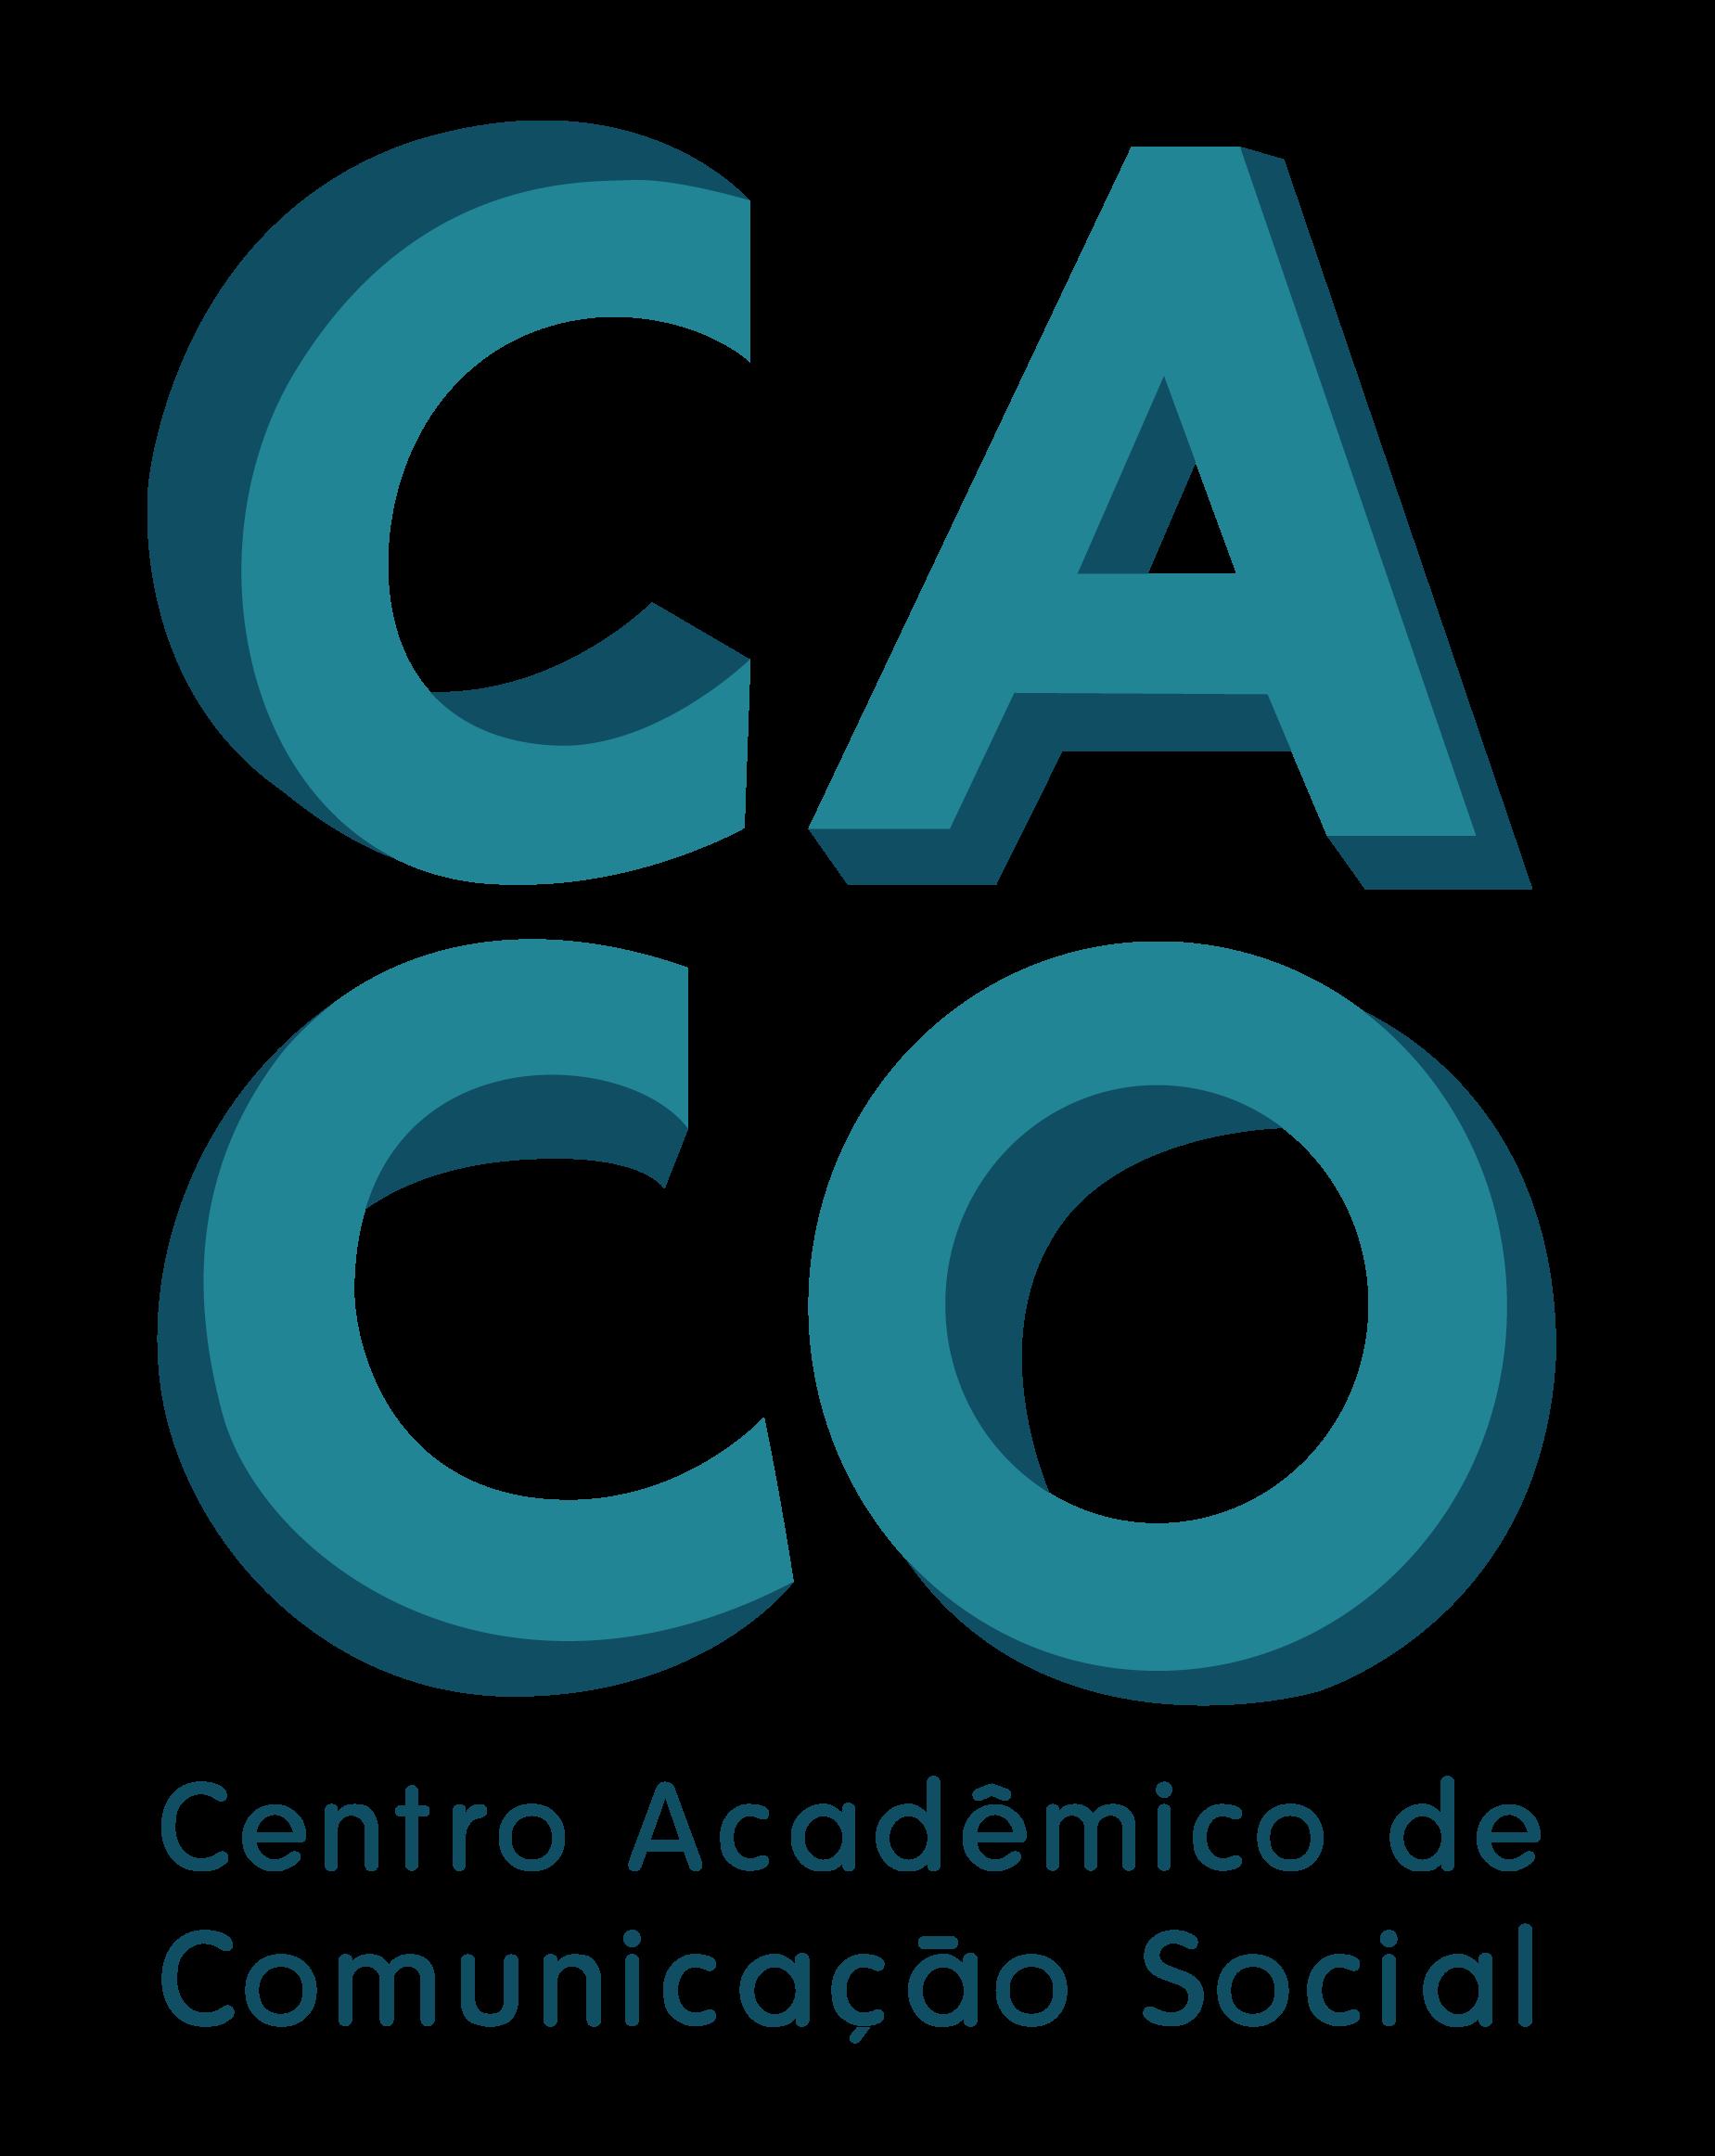 CACO UFPA